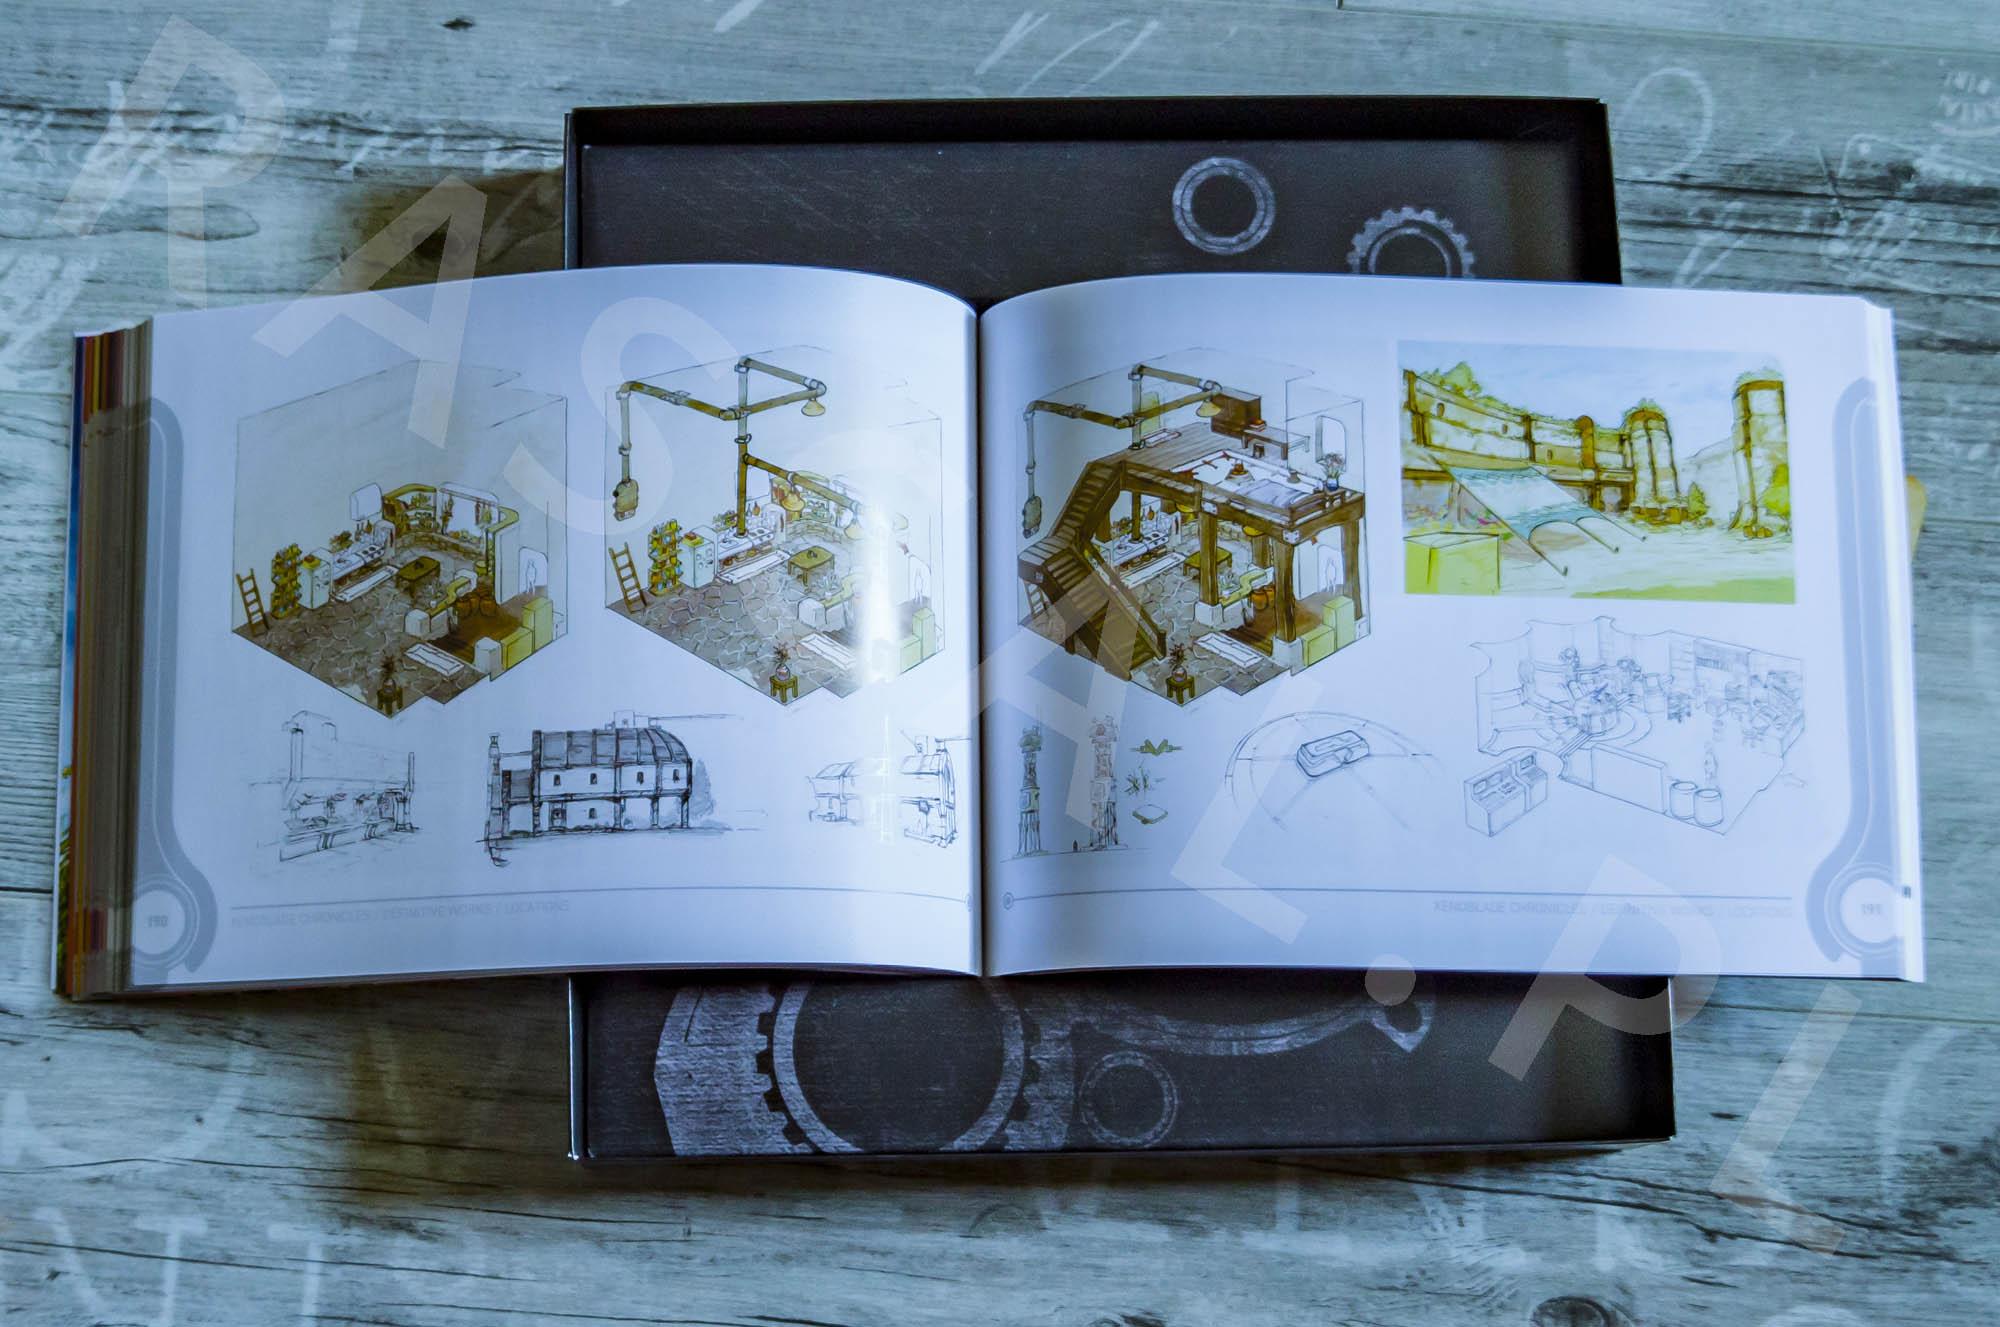 Xenoblade Chronicles Definitive Edition Collectors Set - Artbook - 23 - Lokacje